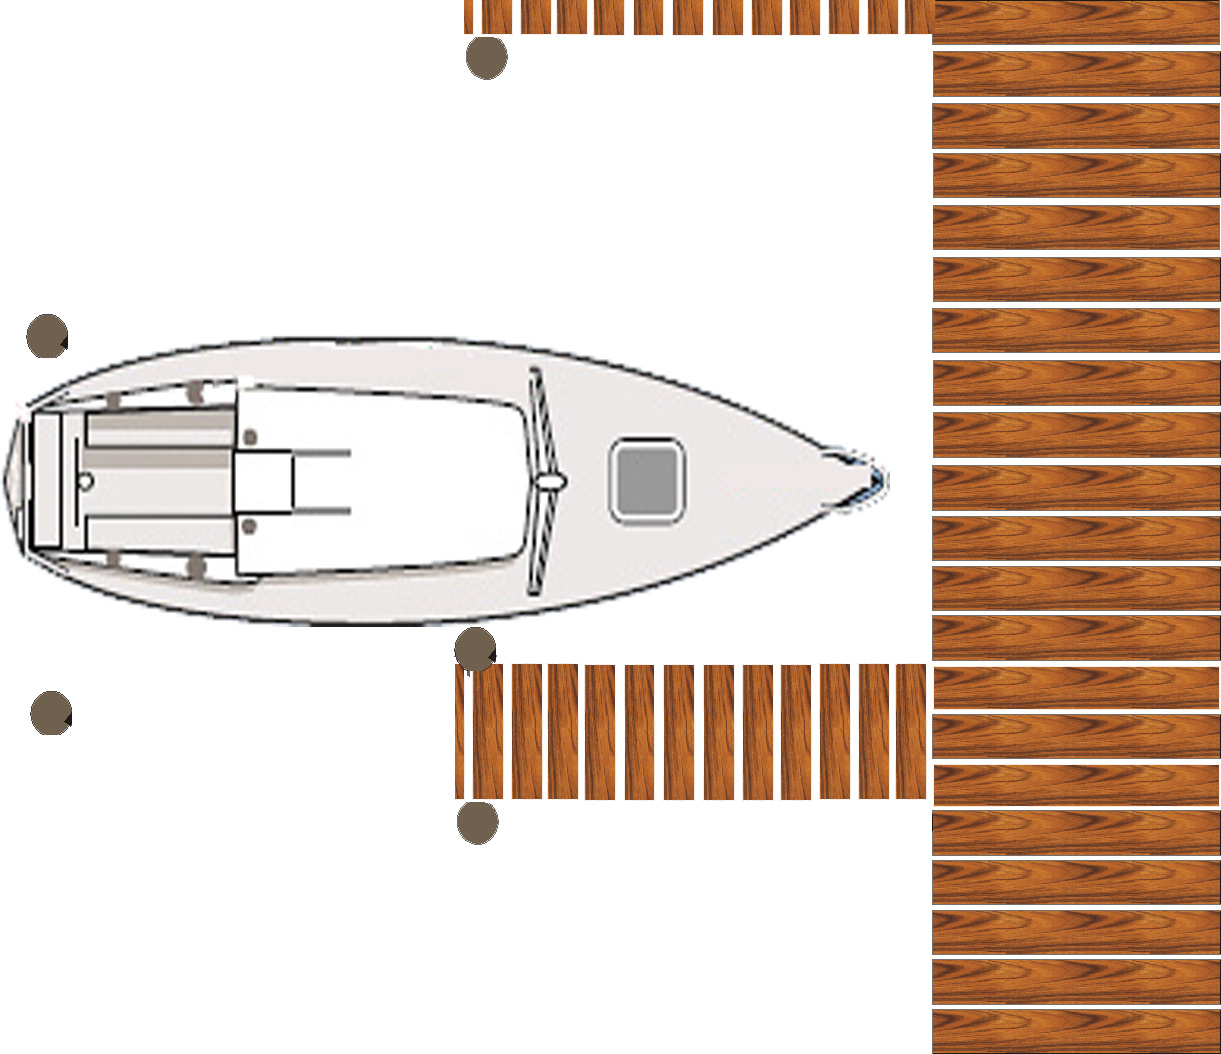 dock diagram 1.jpg